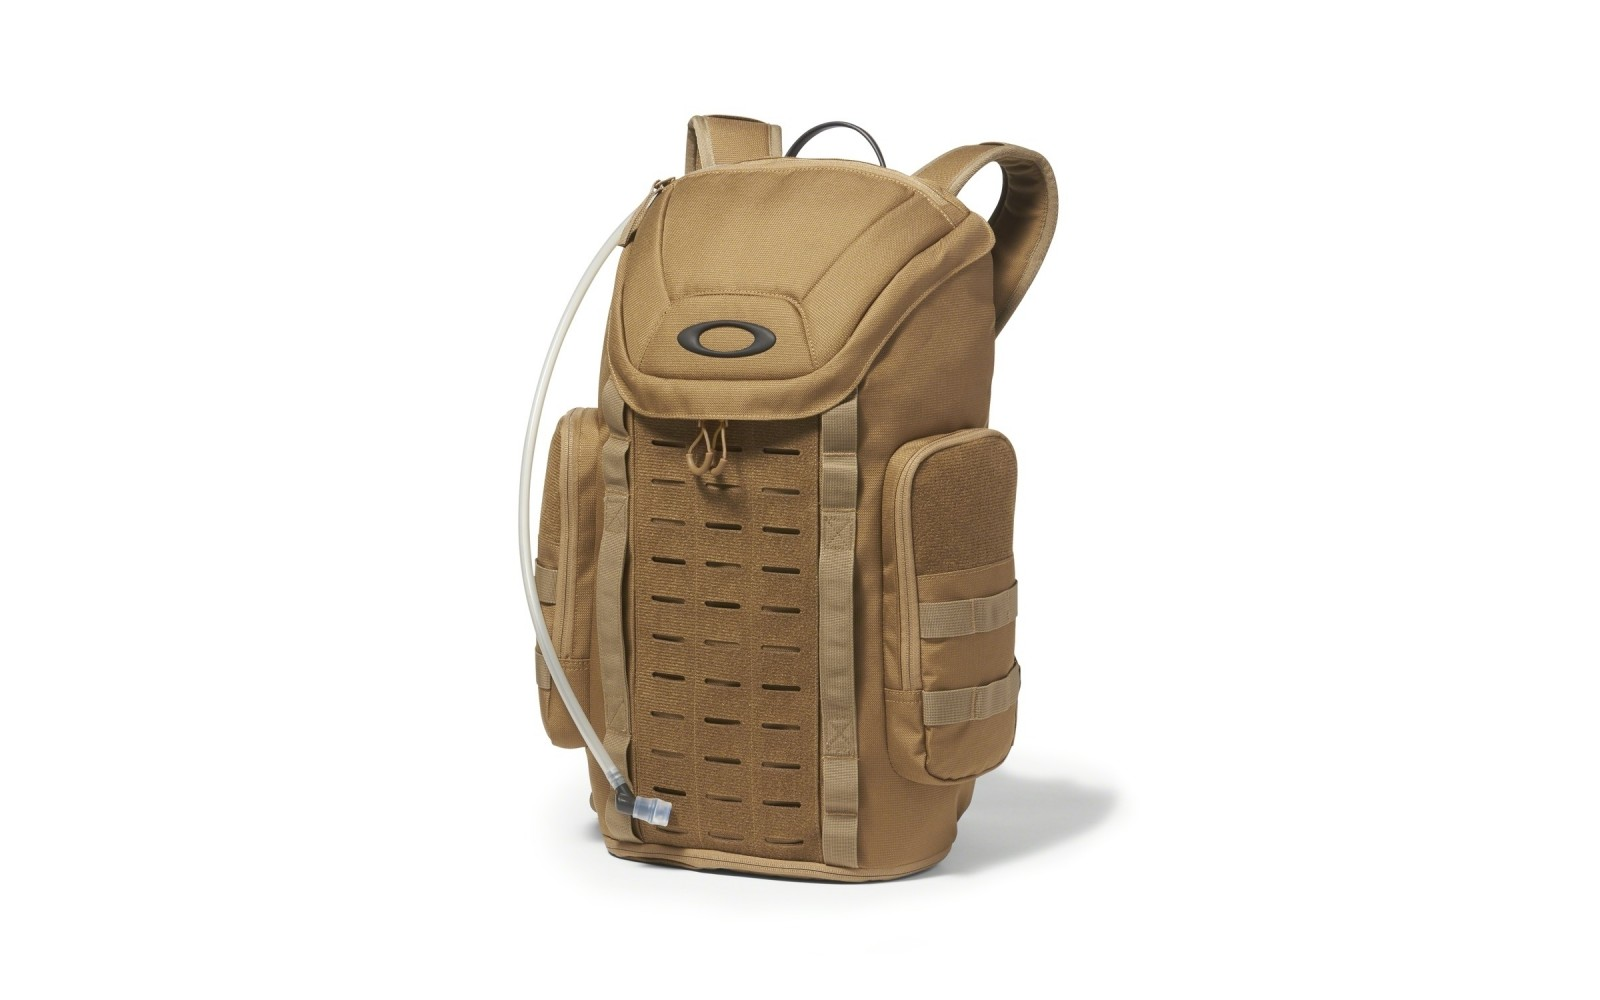 Oakley Link Pack Miltac - Coyote - 921026-86W Rugzak